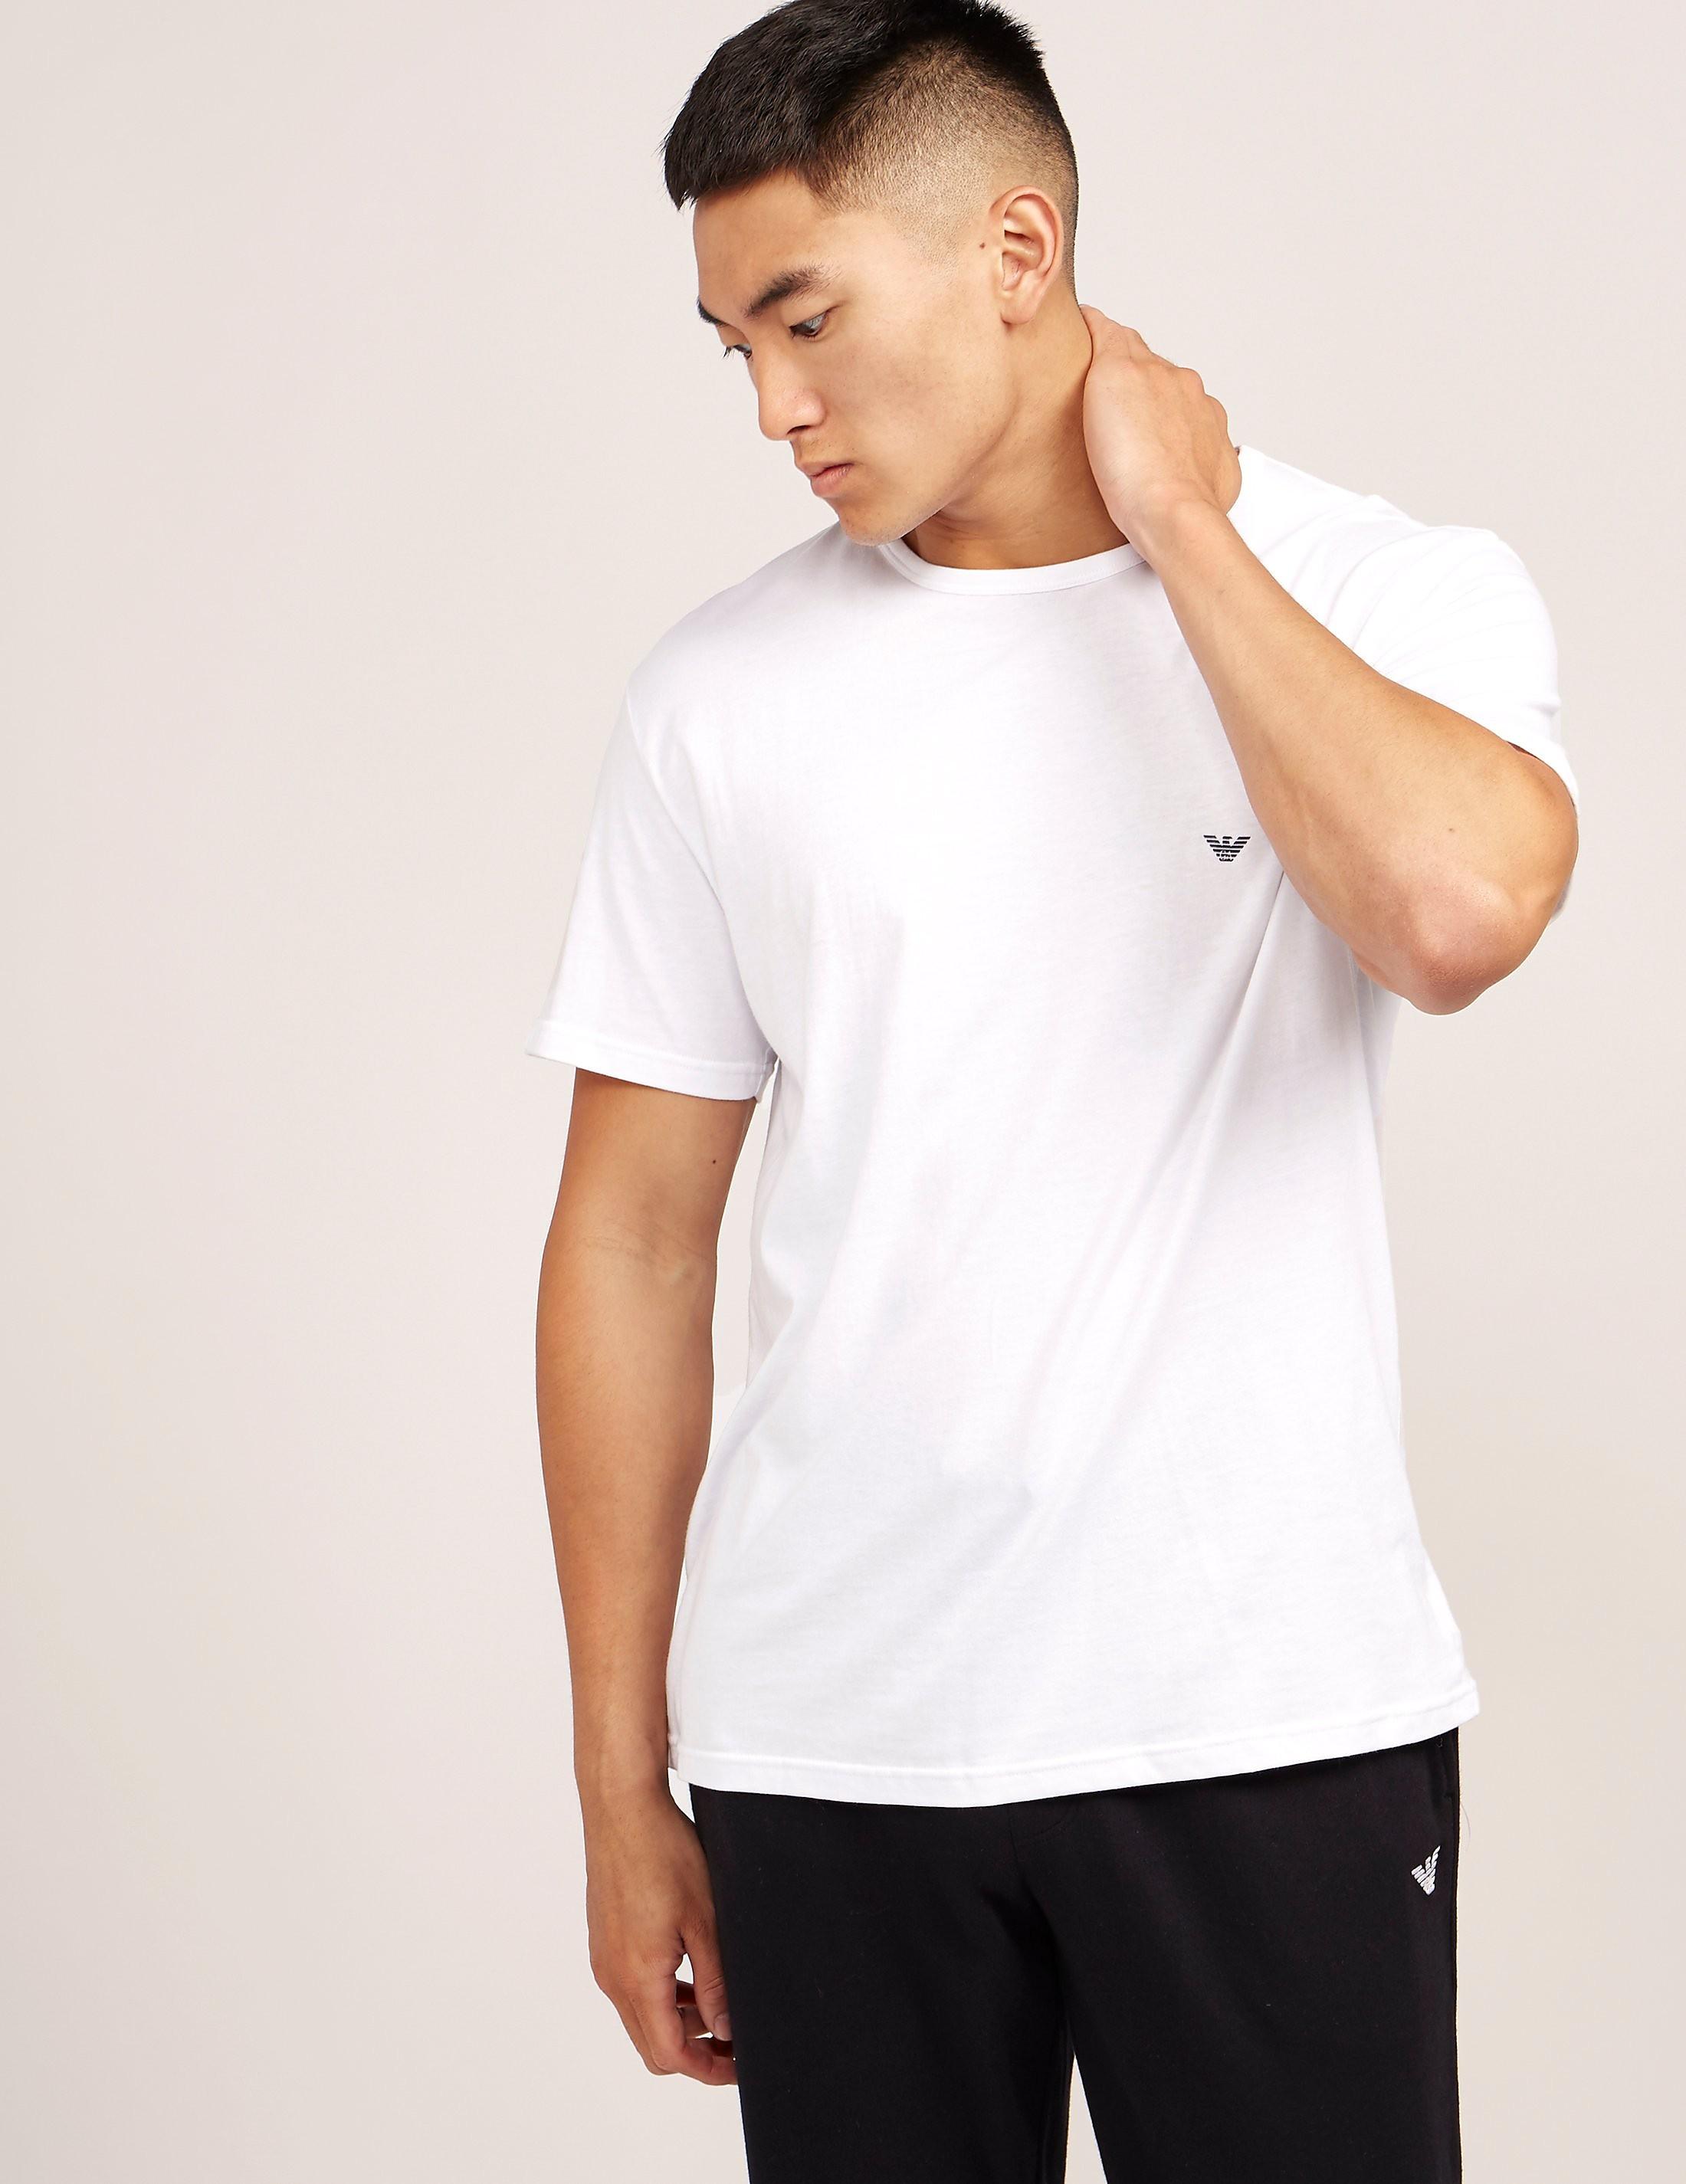 Emporio Armani Crew Neck Short Sleeve T- Shirt